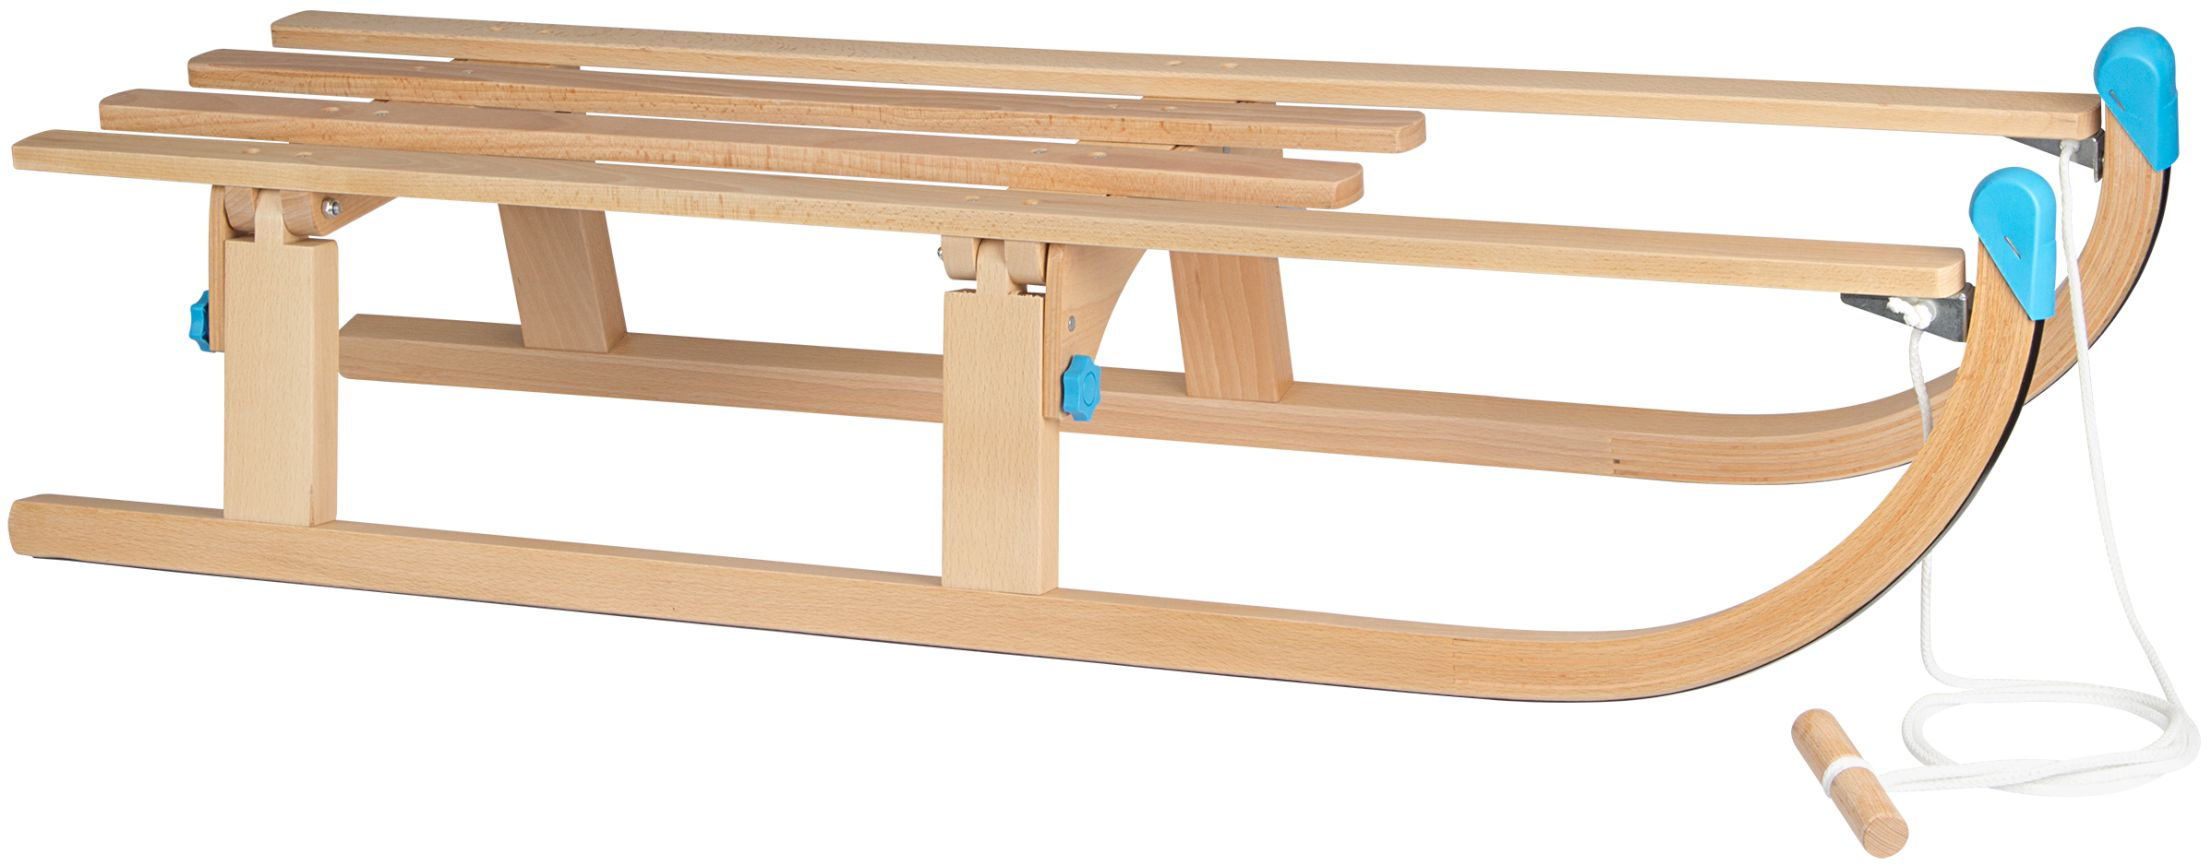 Sanie lemn pliabila 110 cm